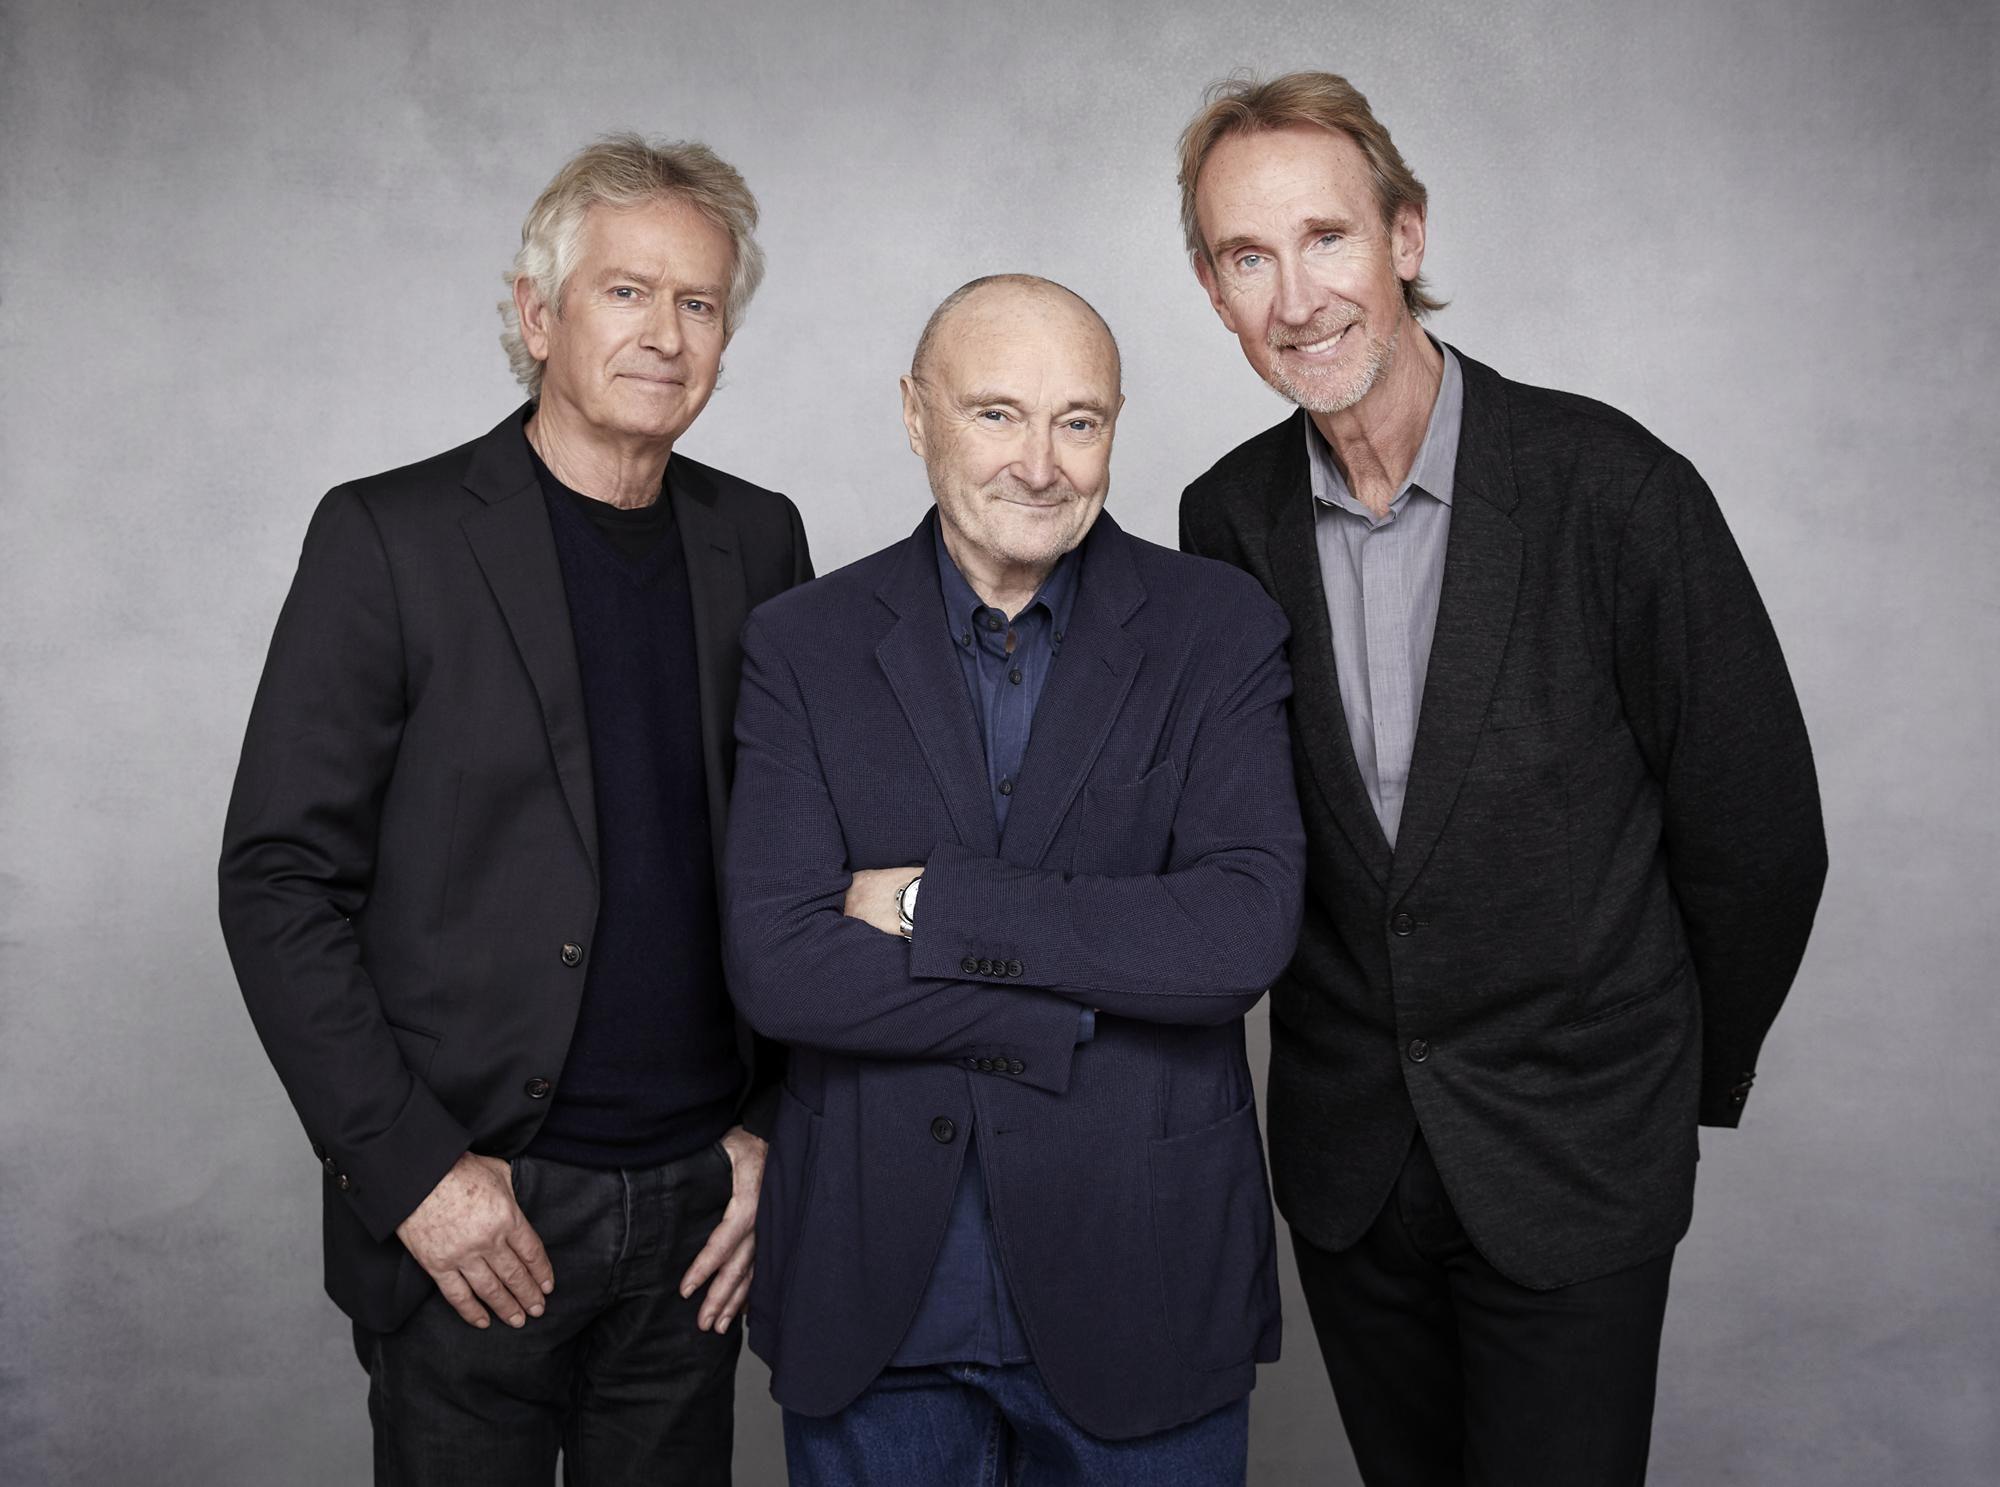 Genesis Announces North American Tour